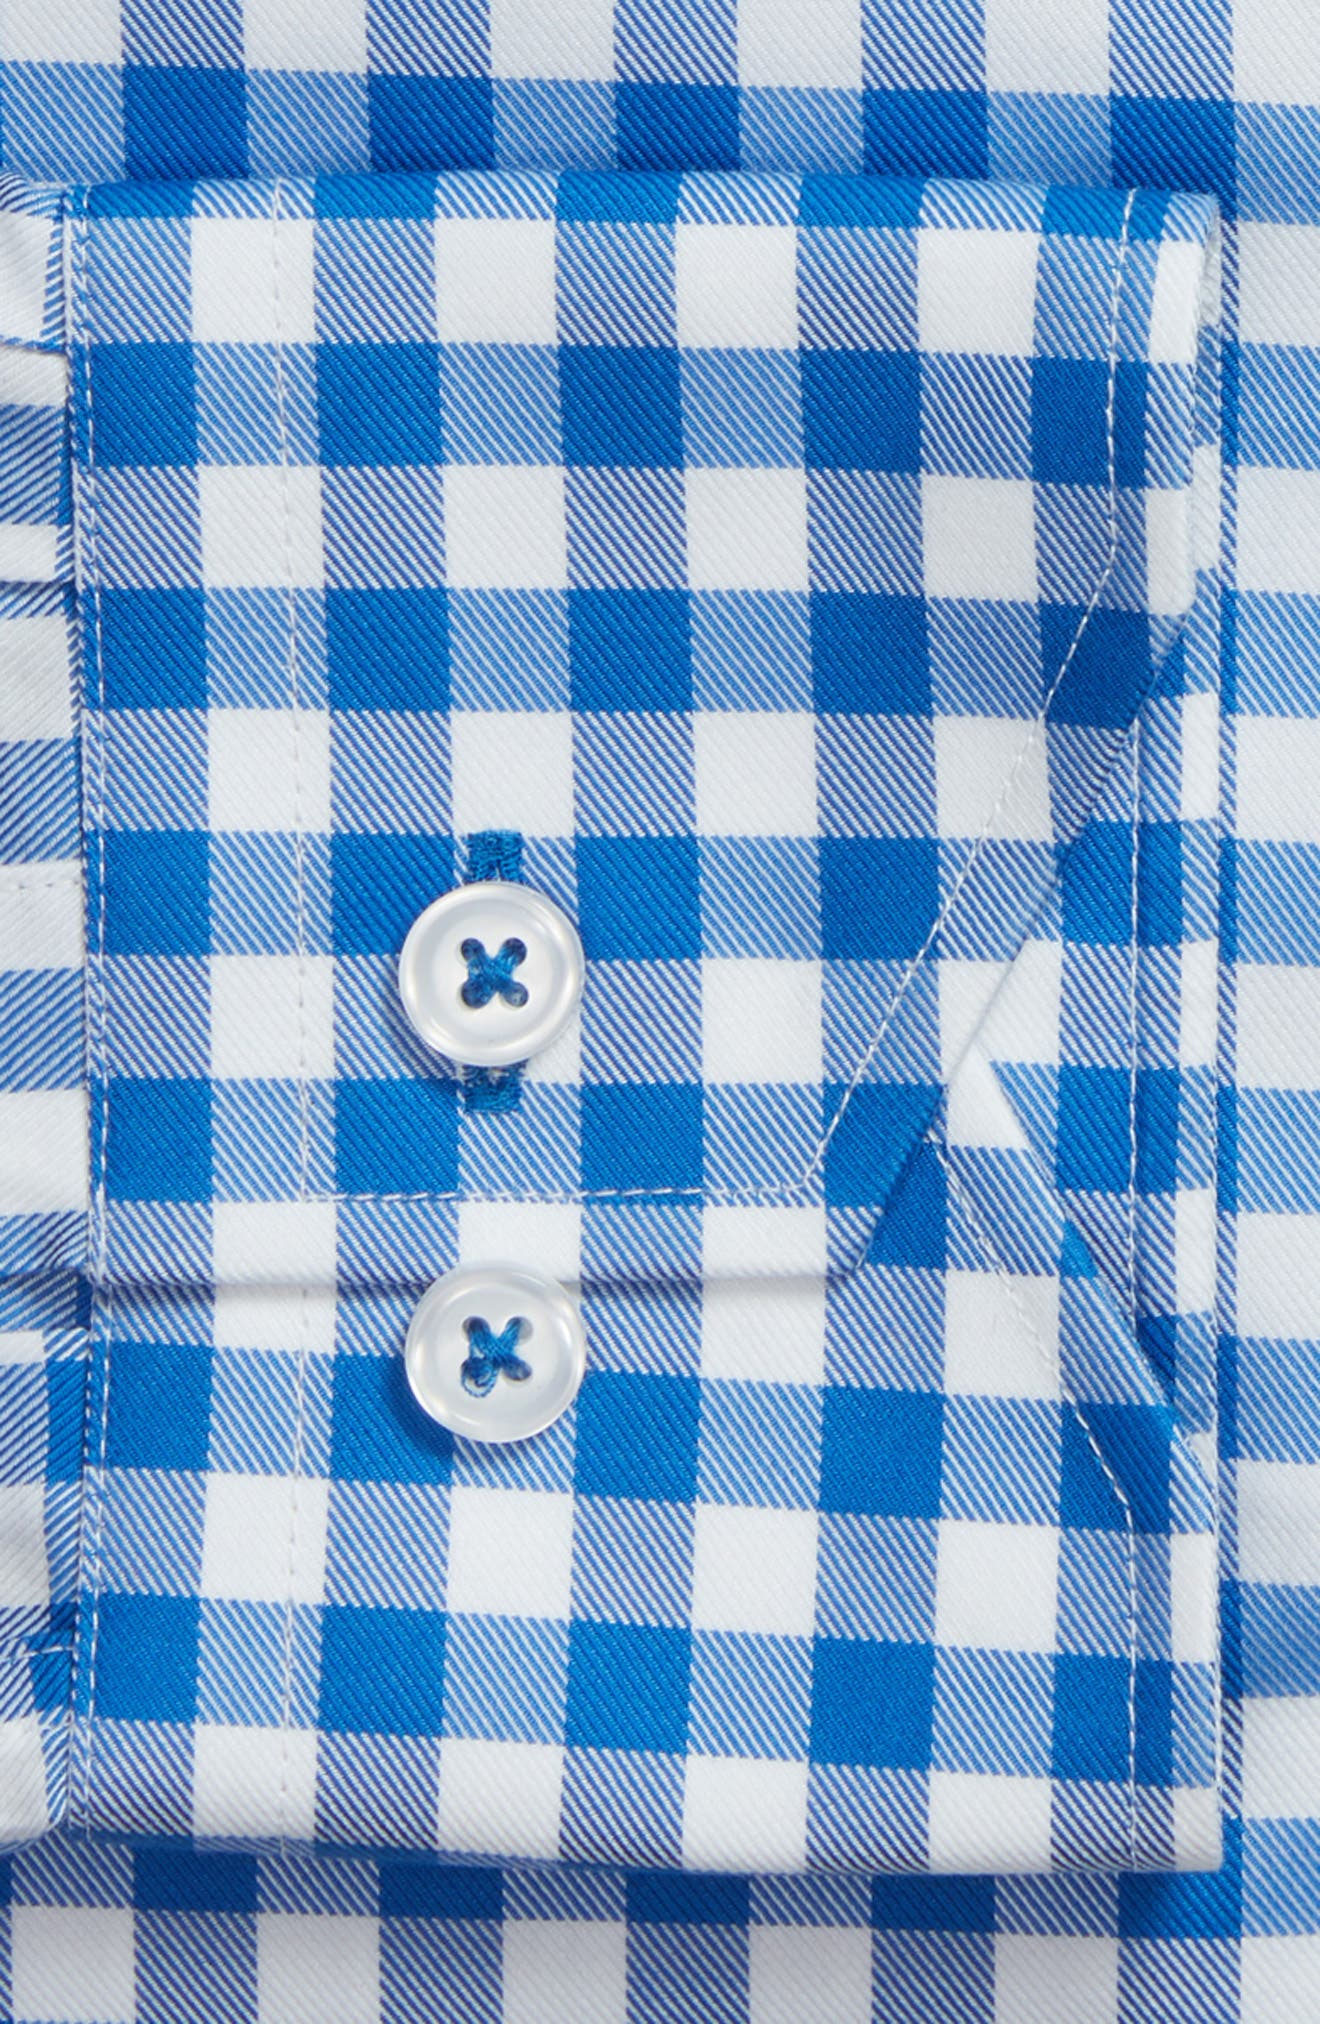 Trim Fit Gingham Dress Shirt,                             Alternate thumbnail 6, color,                             404